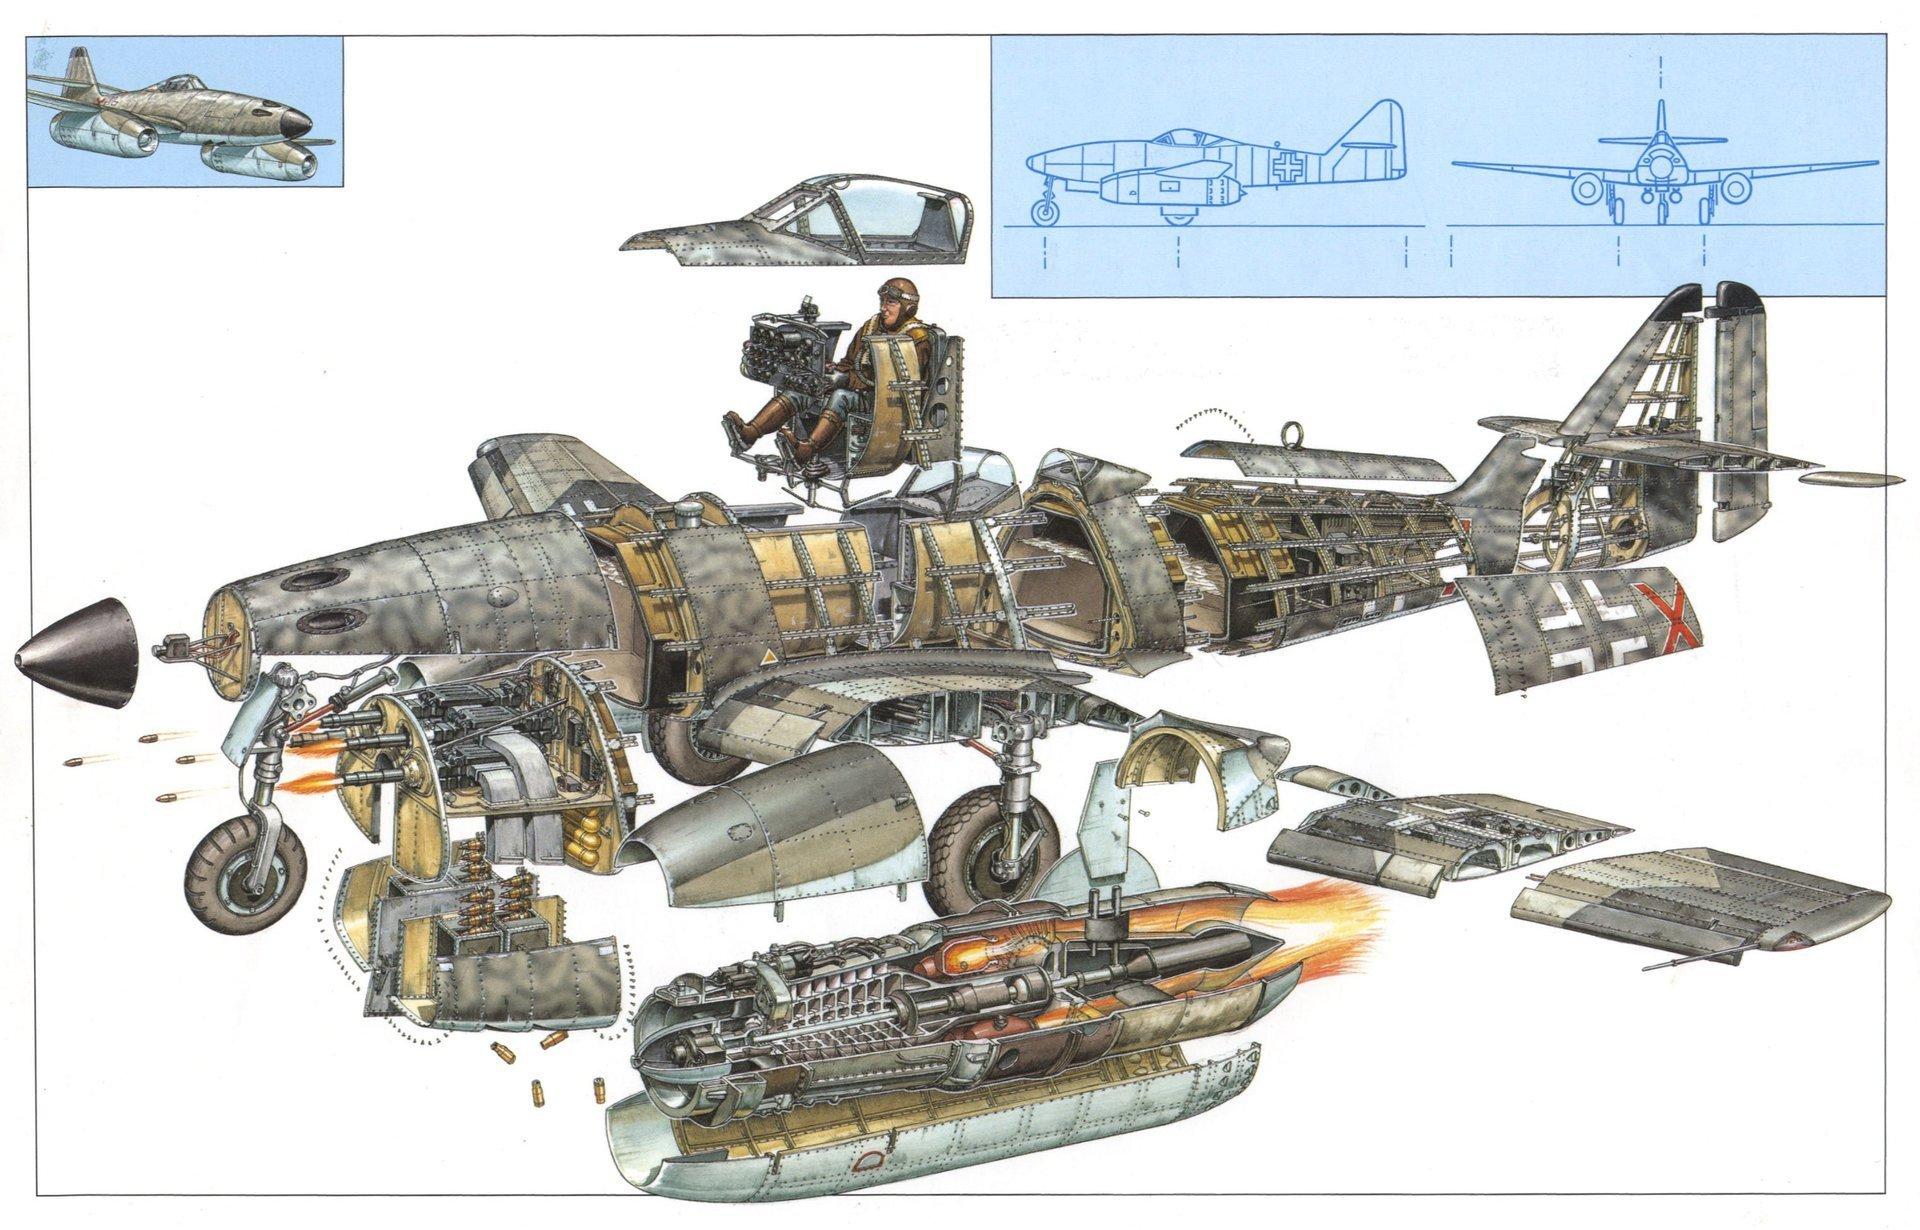 ME 262 - Page 2 - General Discussion - IL-2 Sturmovik Forum